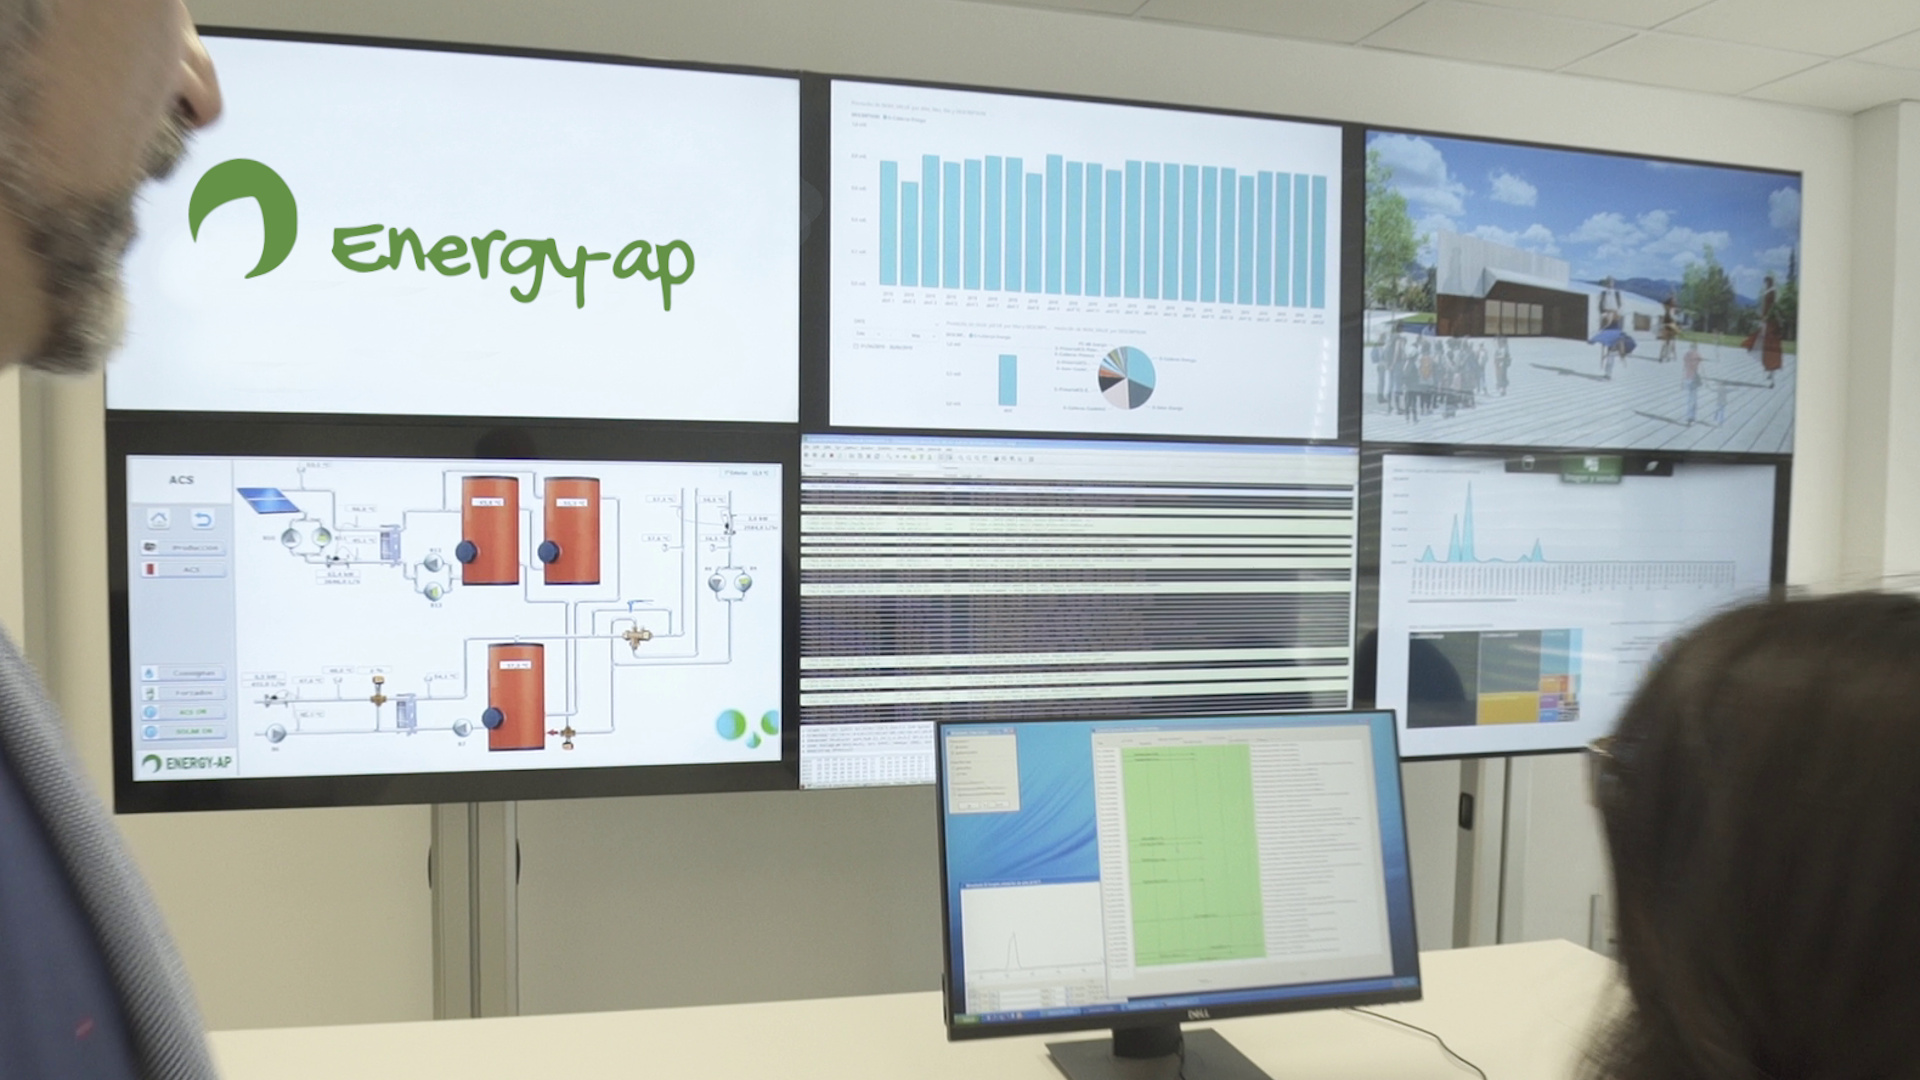 Monitorizacion Energy-Ap